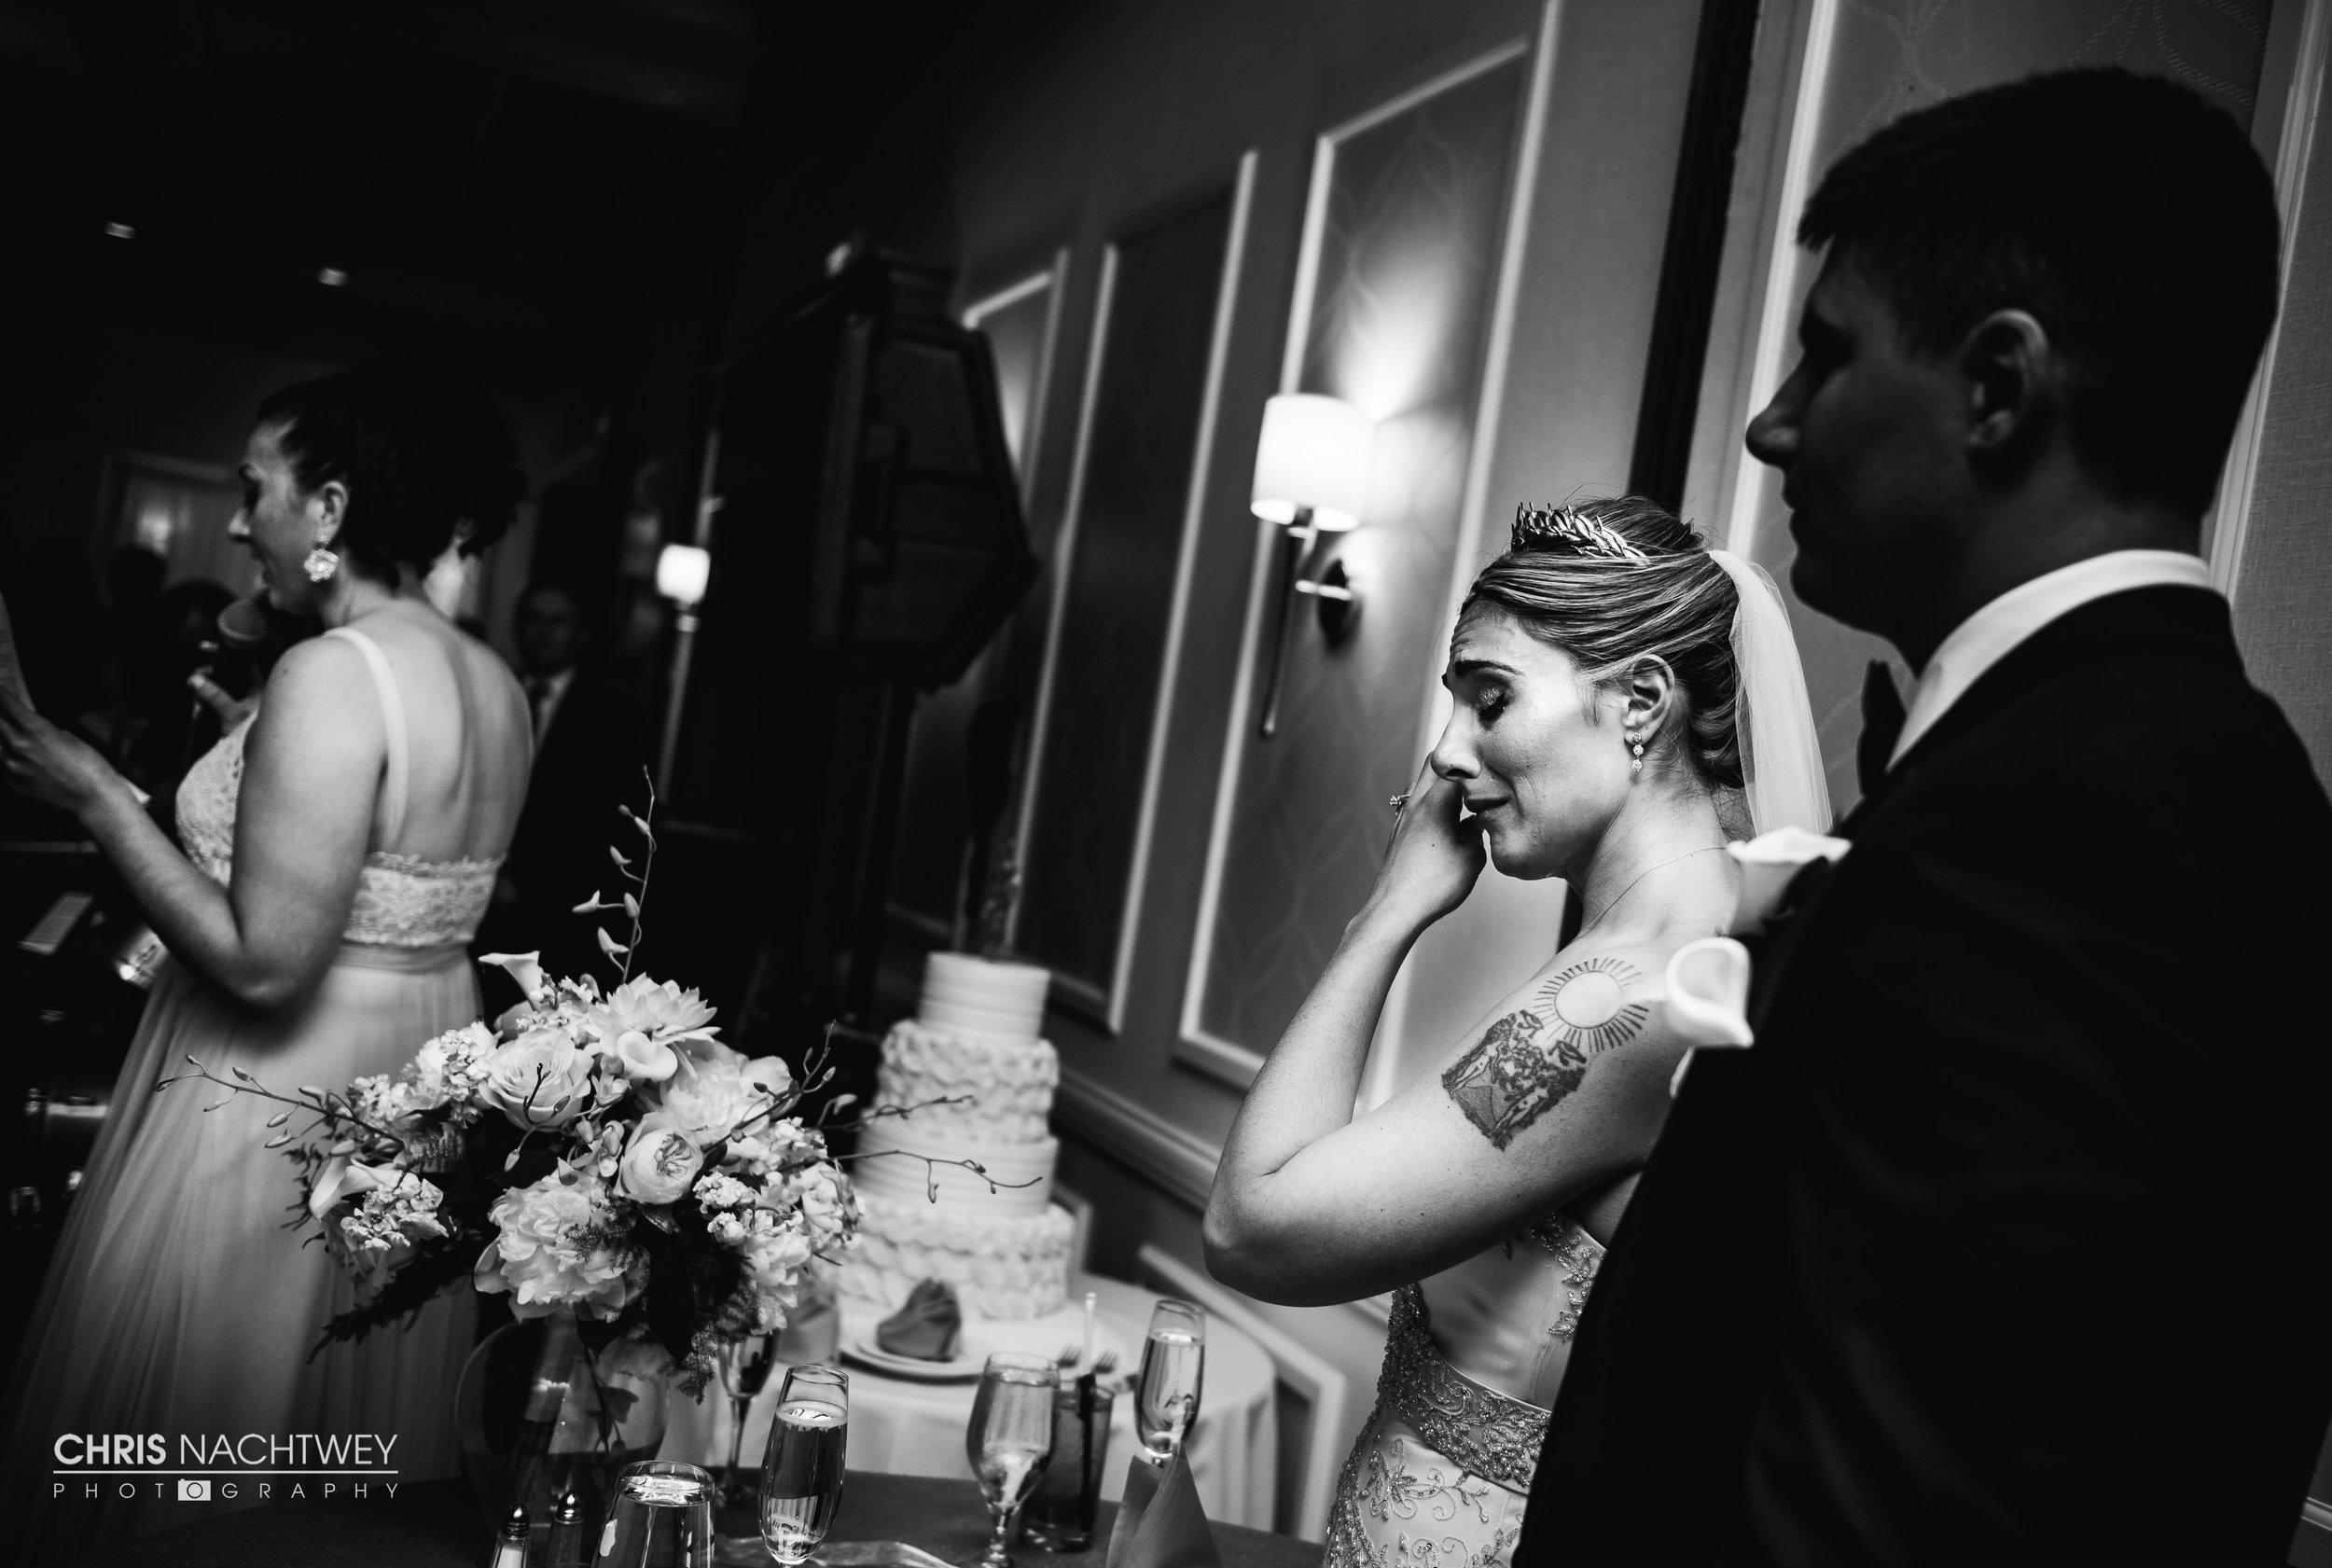 mystic-hilton-wedding-photographer-chris-nachtwey-2017-22.jpg